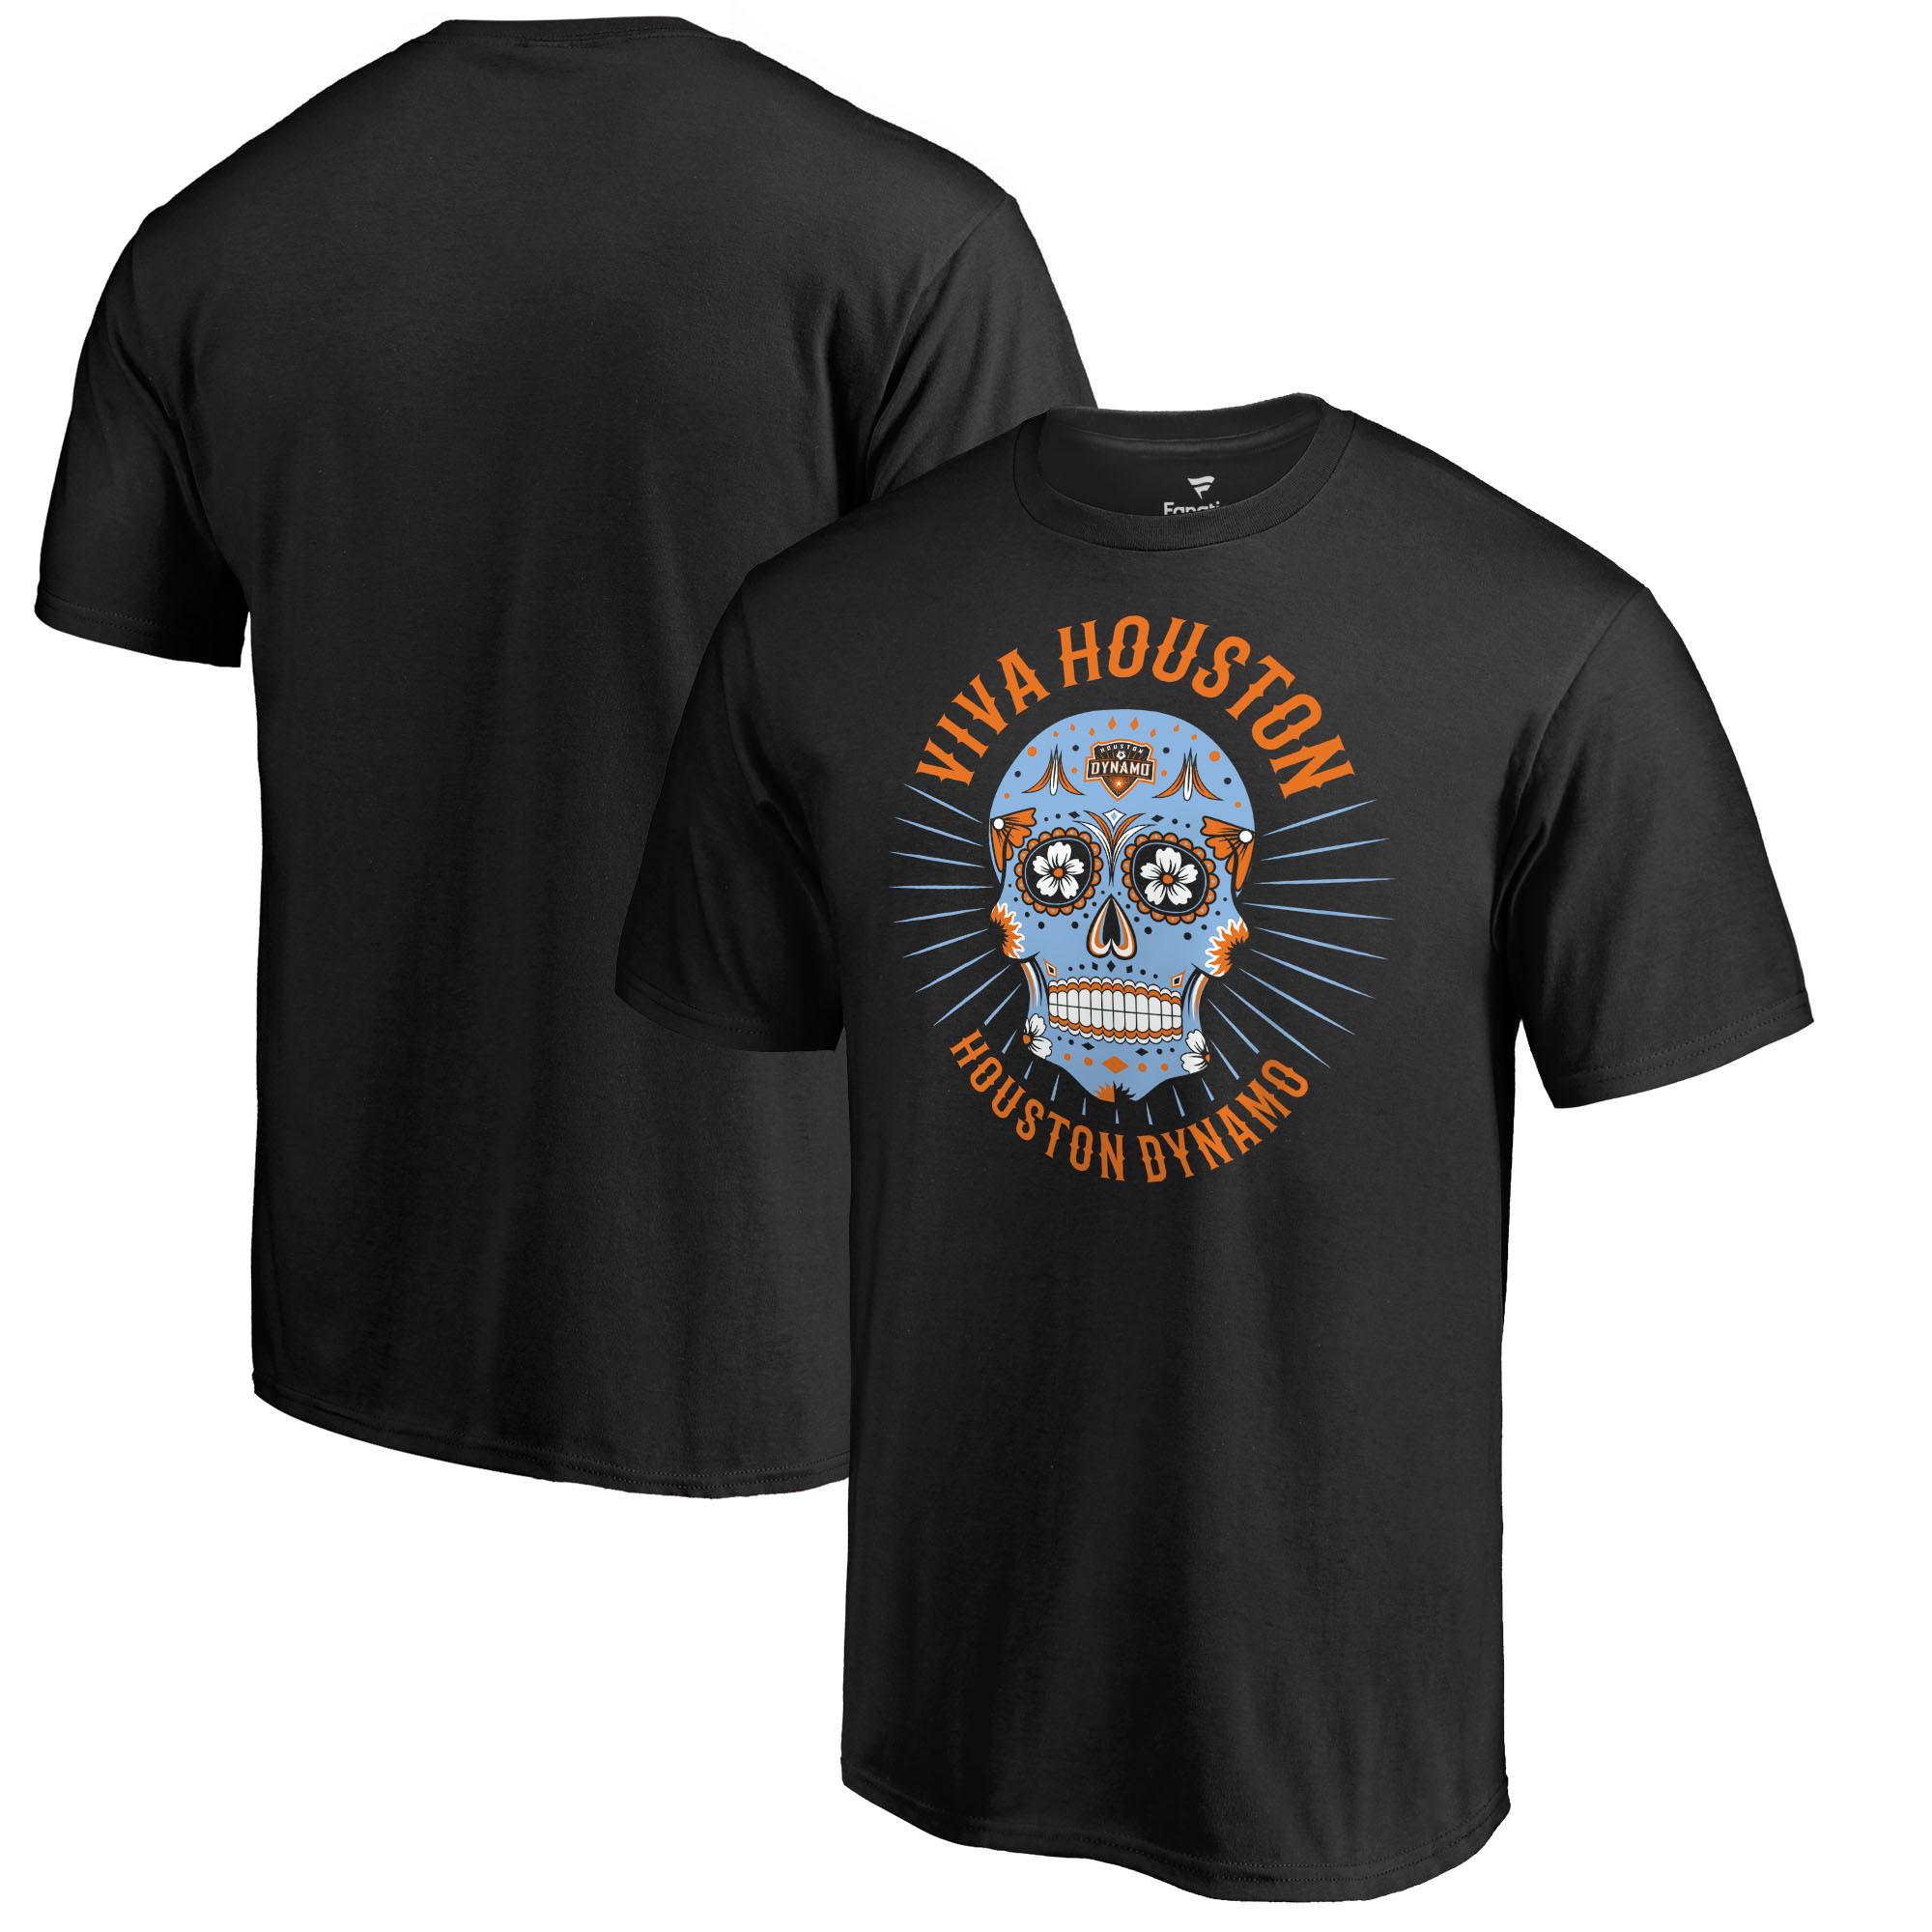 Houston Dynamo Fanatics Branded Hispanic Heritage Viva T-Shirt T-Shirt - Black